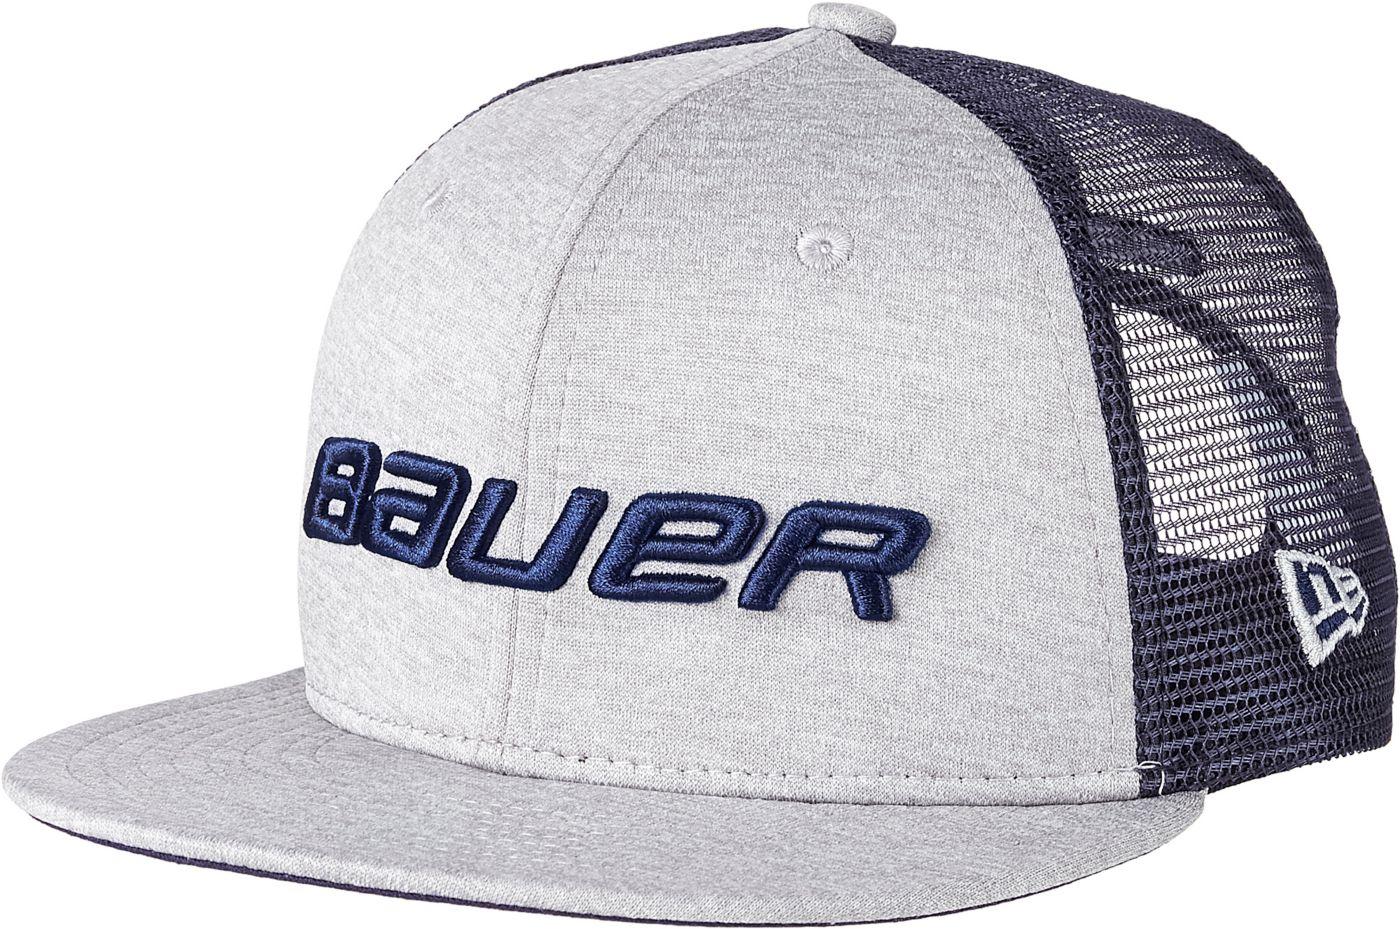 Bauer Youth 9Fifty Snapback Hockey Hat